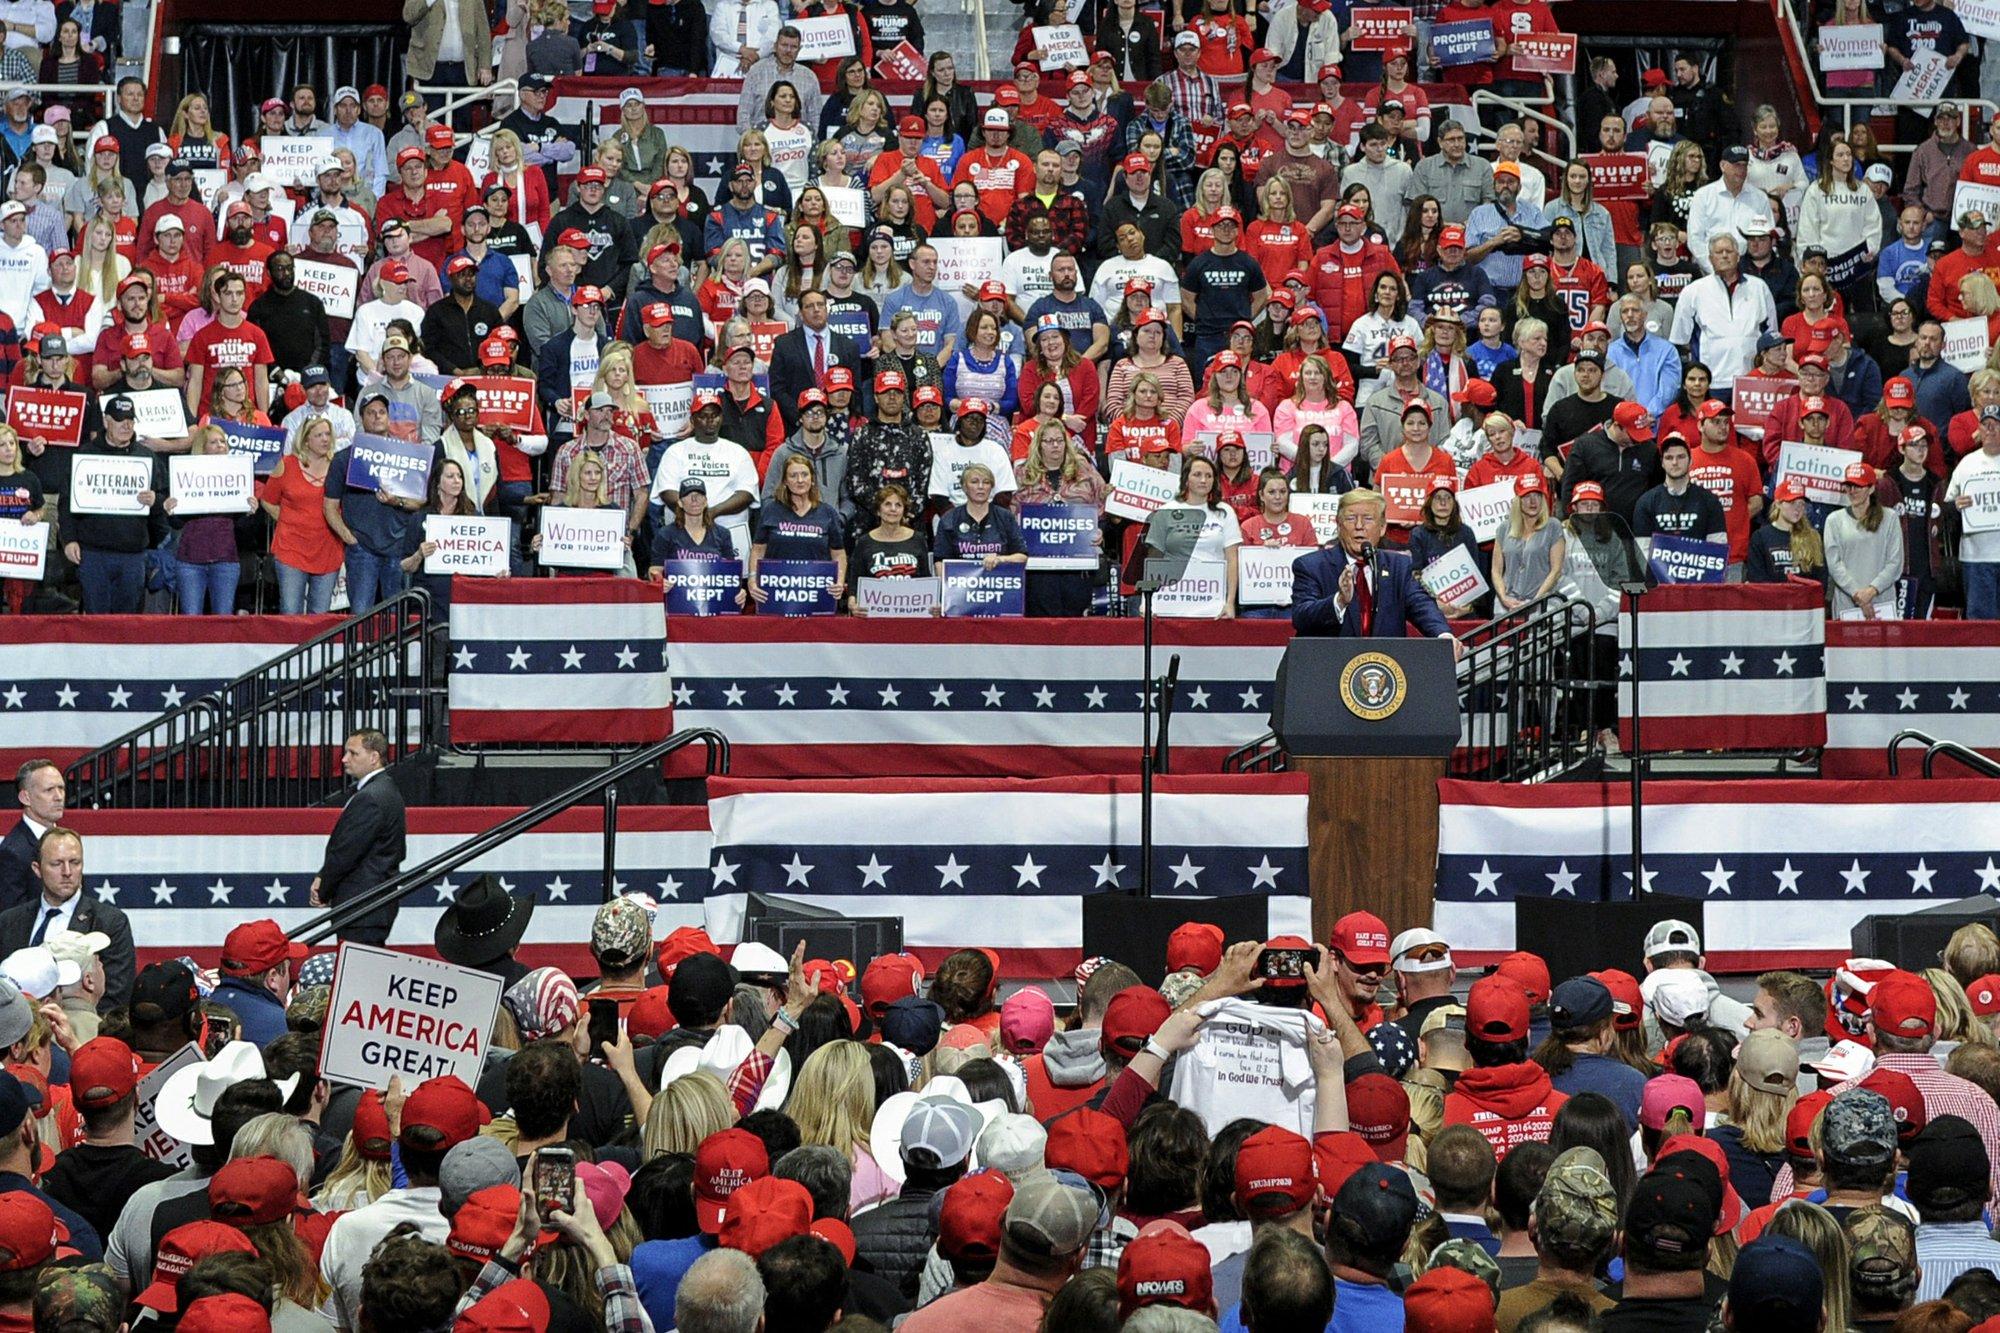 Trump rally called 'dangerous move' in age of coronavirus